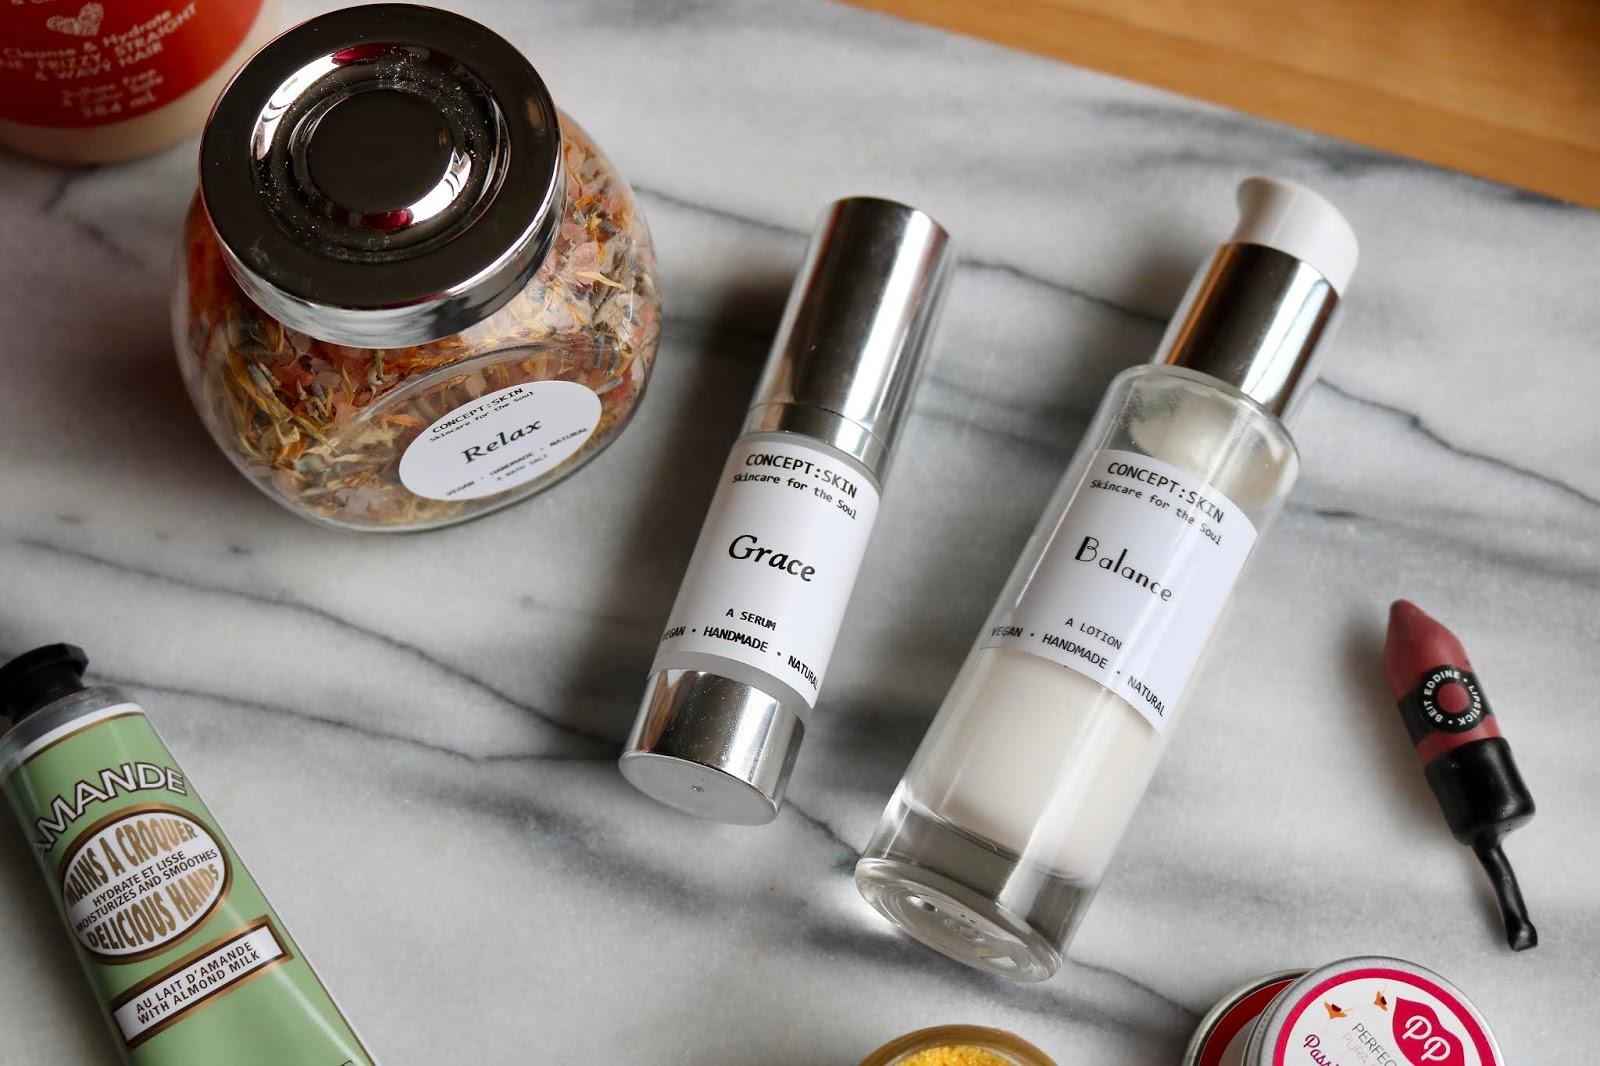 Grace Serum, Balance Lotion and Relax Bath Salts